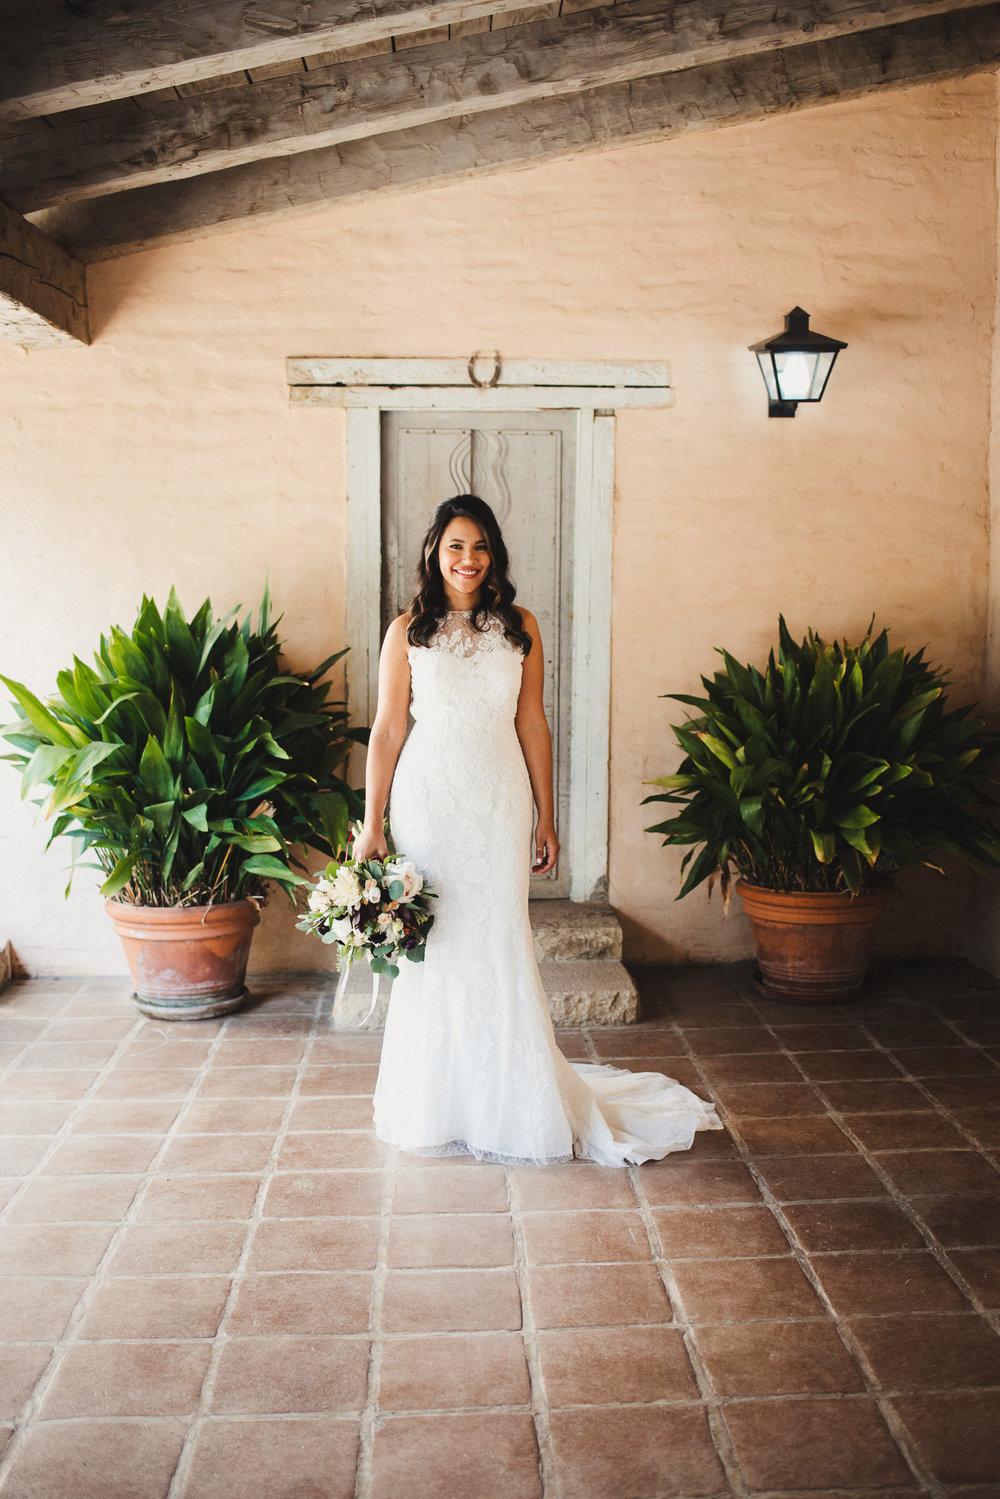 sSarah + Kev - Santa Barbara Historic Museum - 04 Bride Portraits-17.jpg